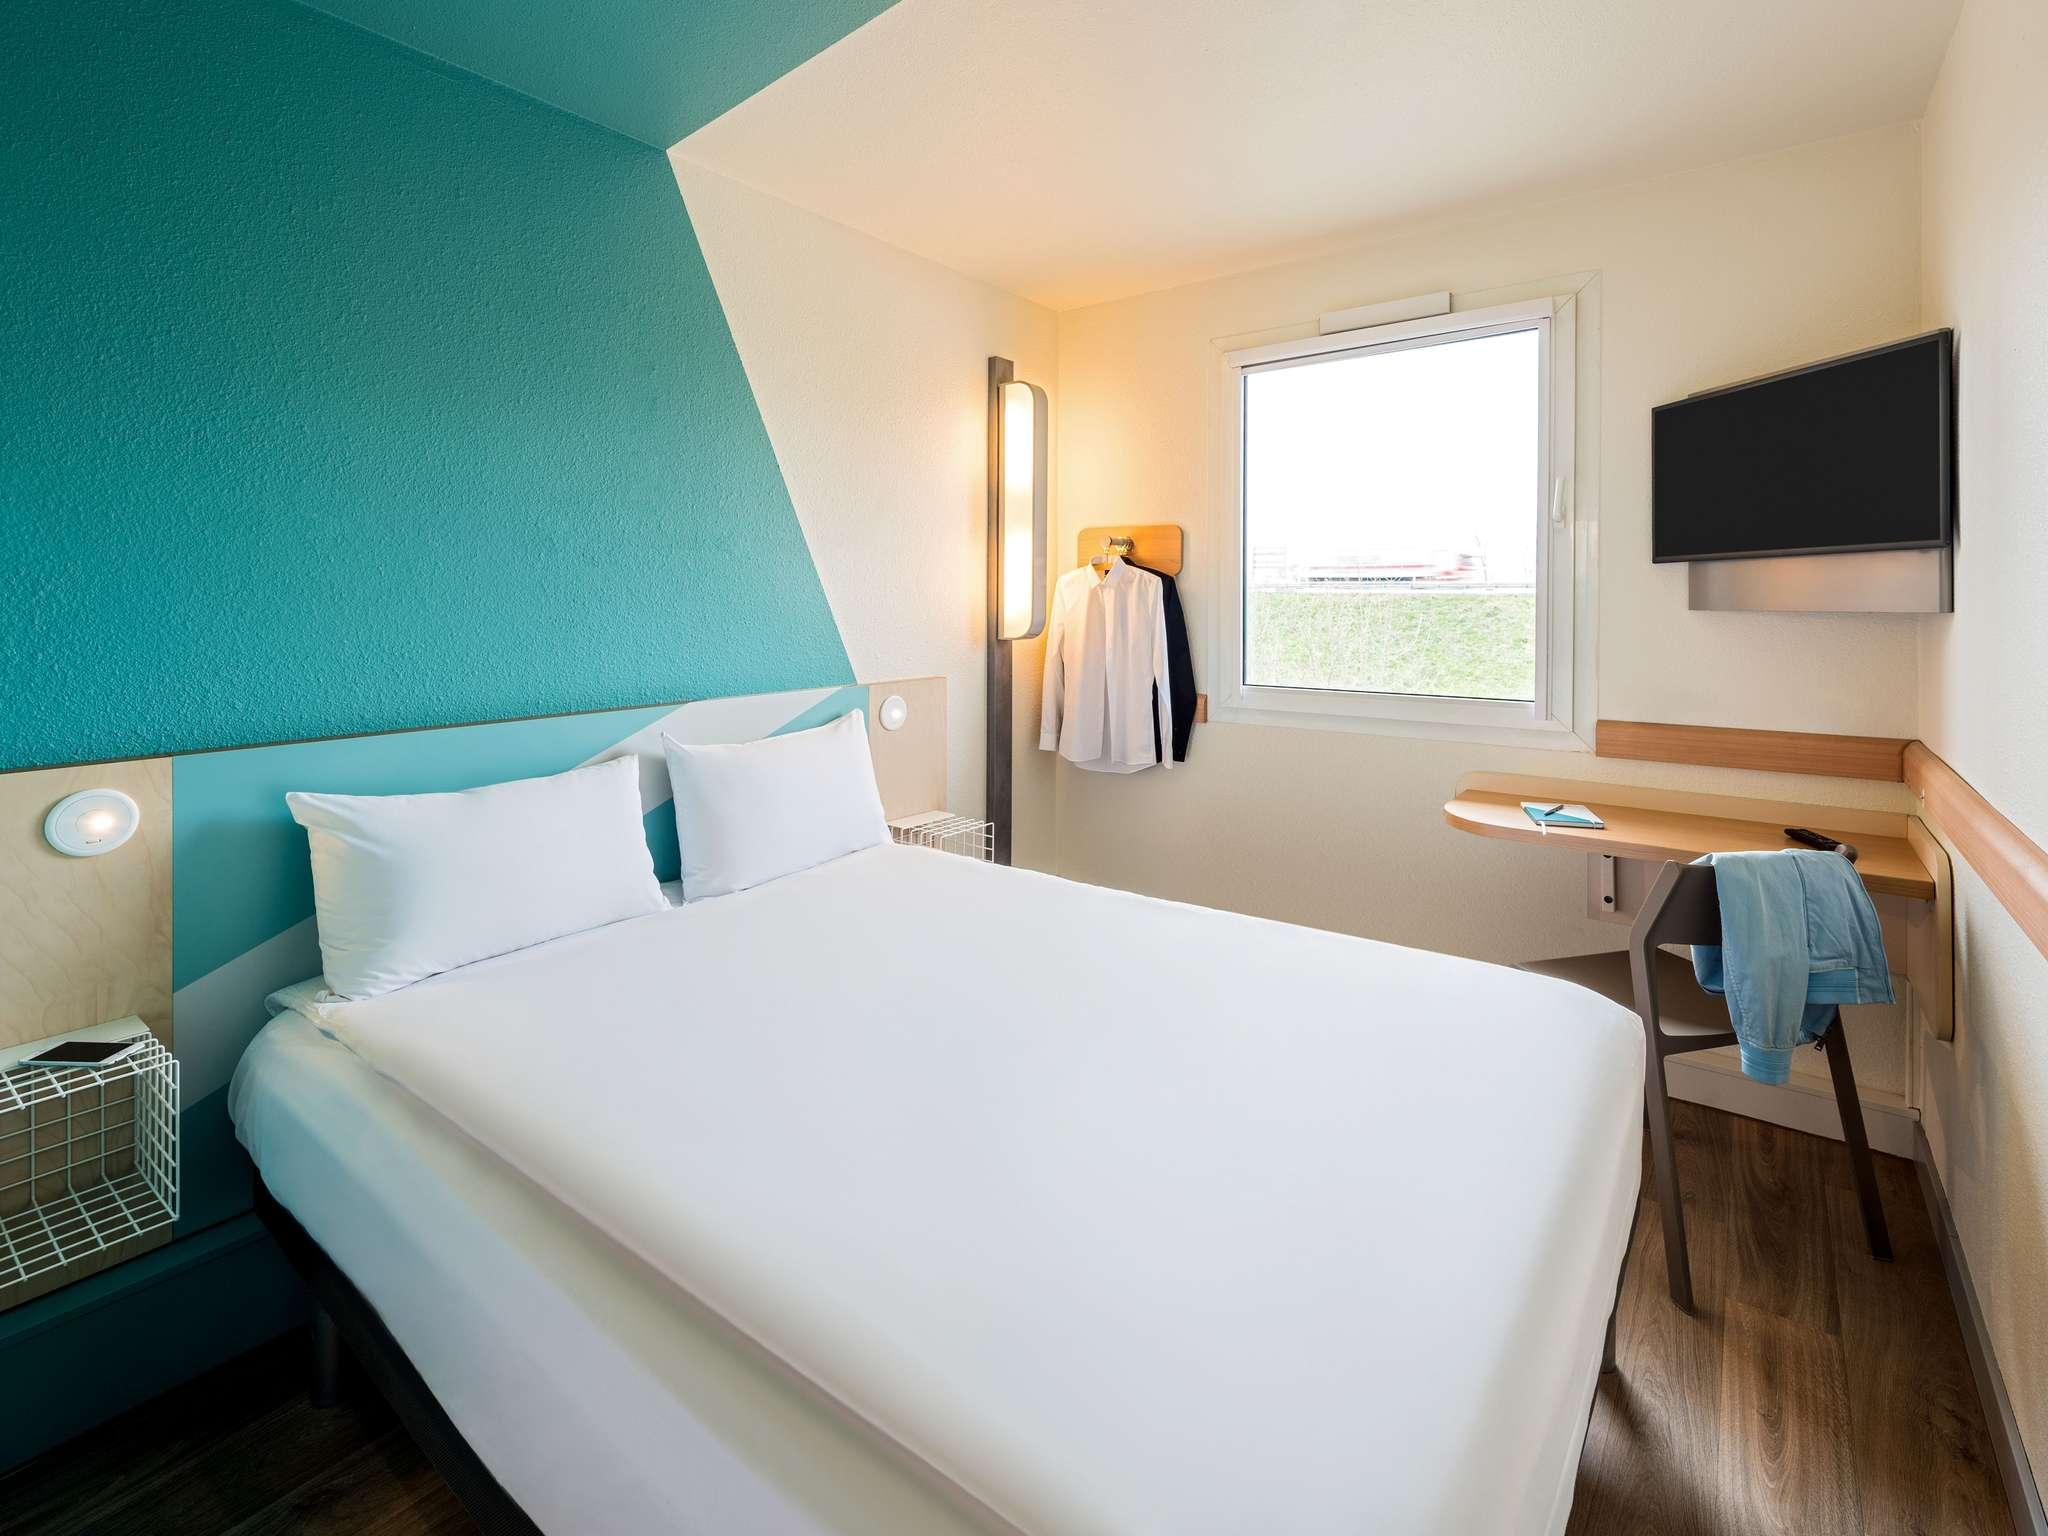 hotel ibis budget regensburg ost book now free wifi. Black Bedroom Furniture Sets. Home Design Ideas